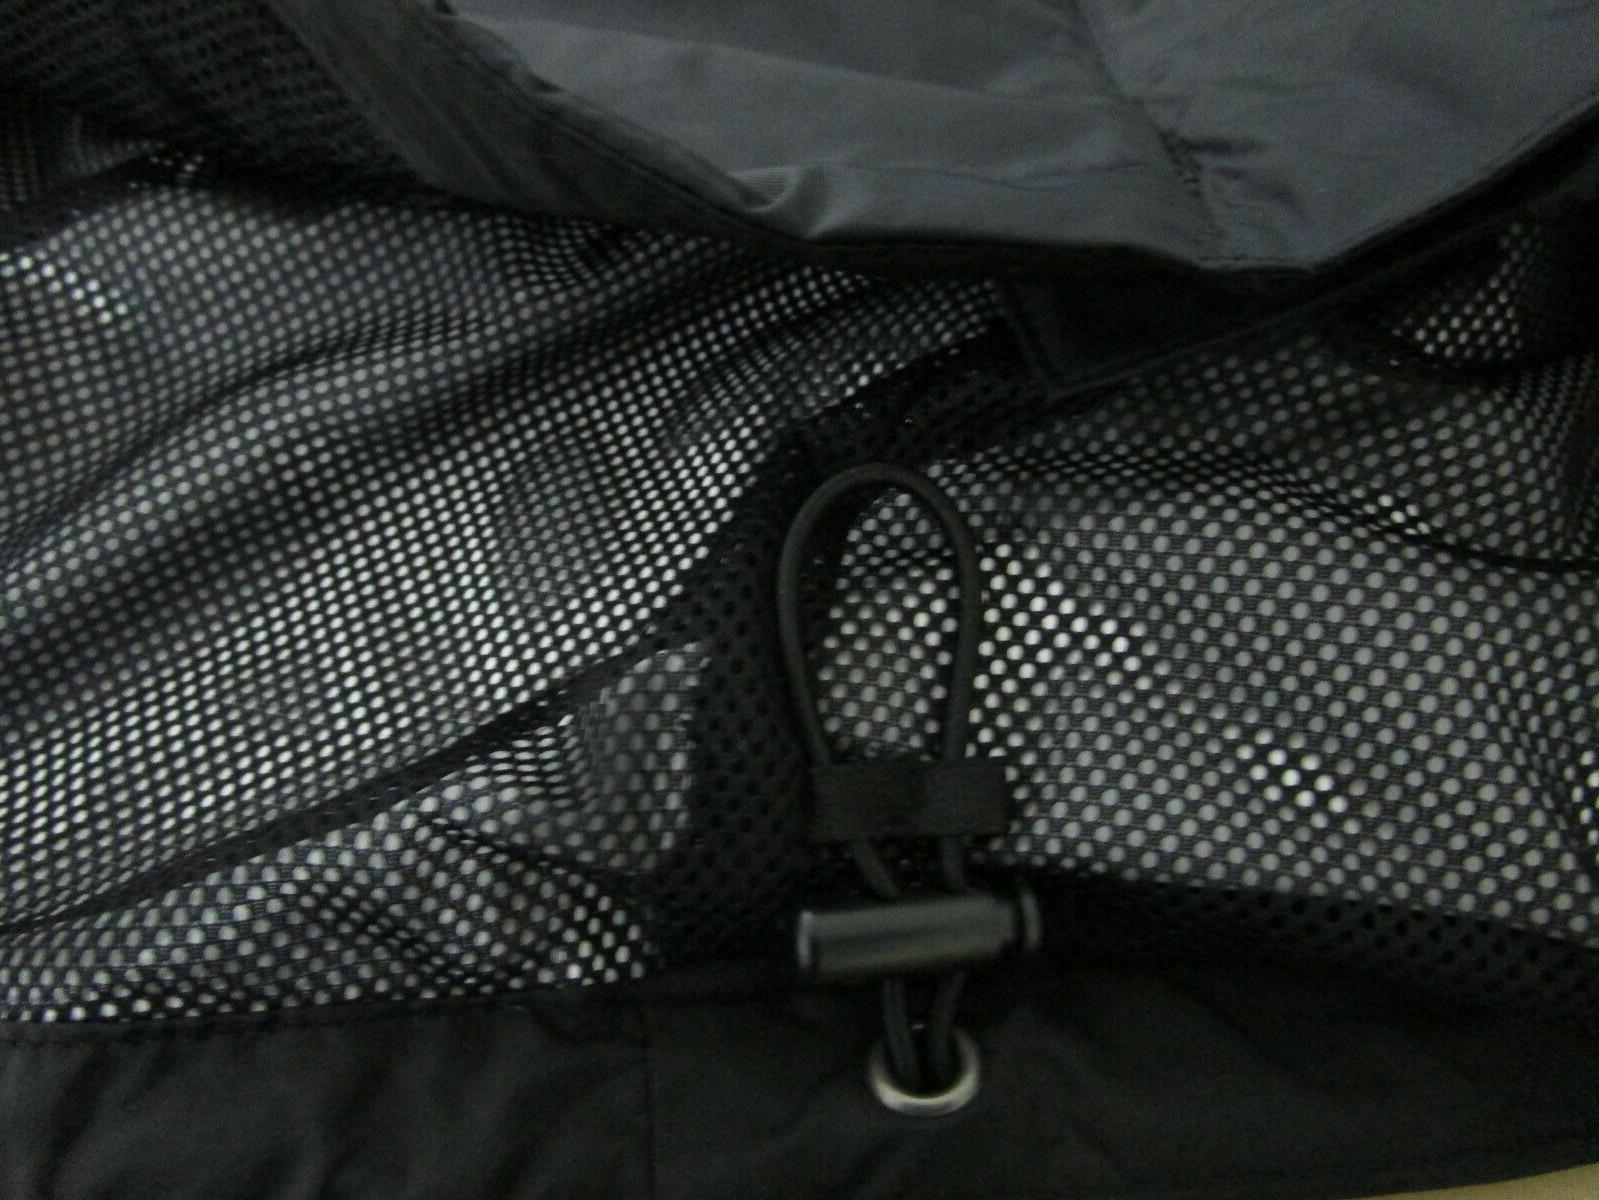 Pointe Waterproof Rain Jacket